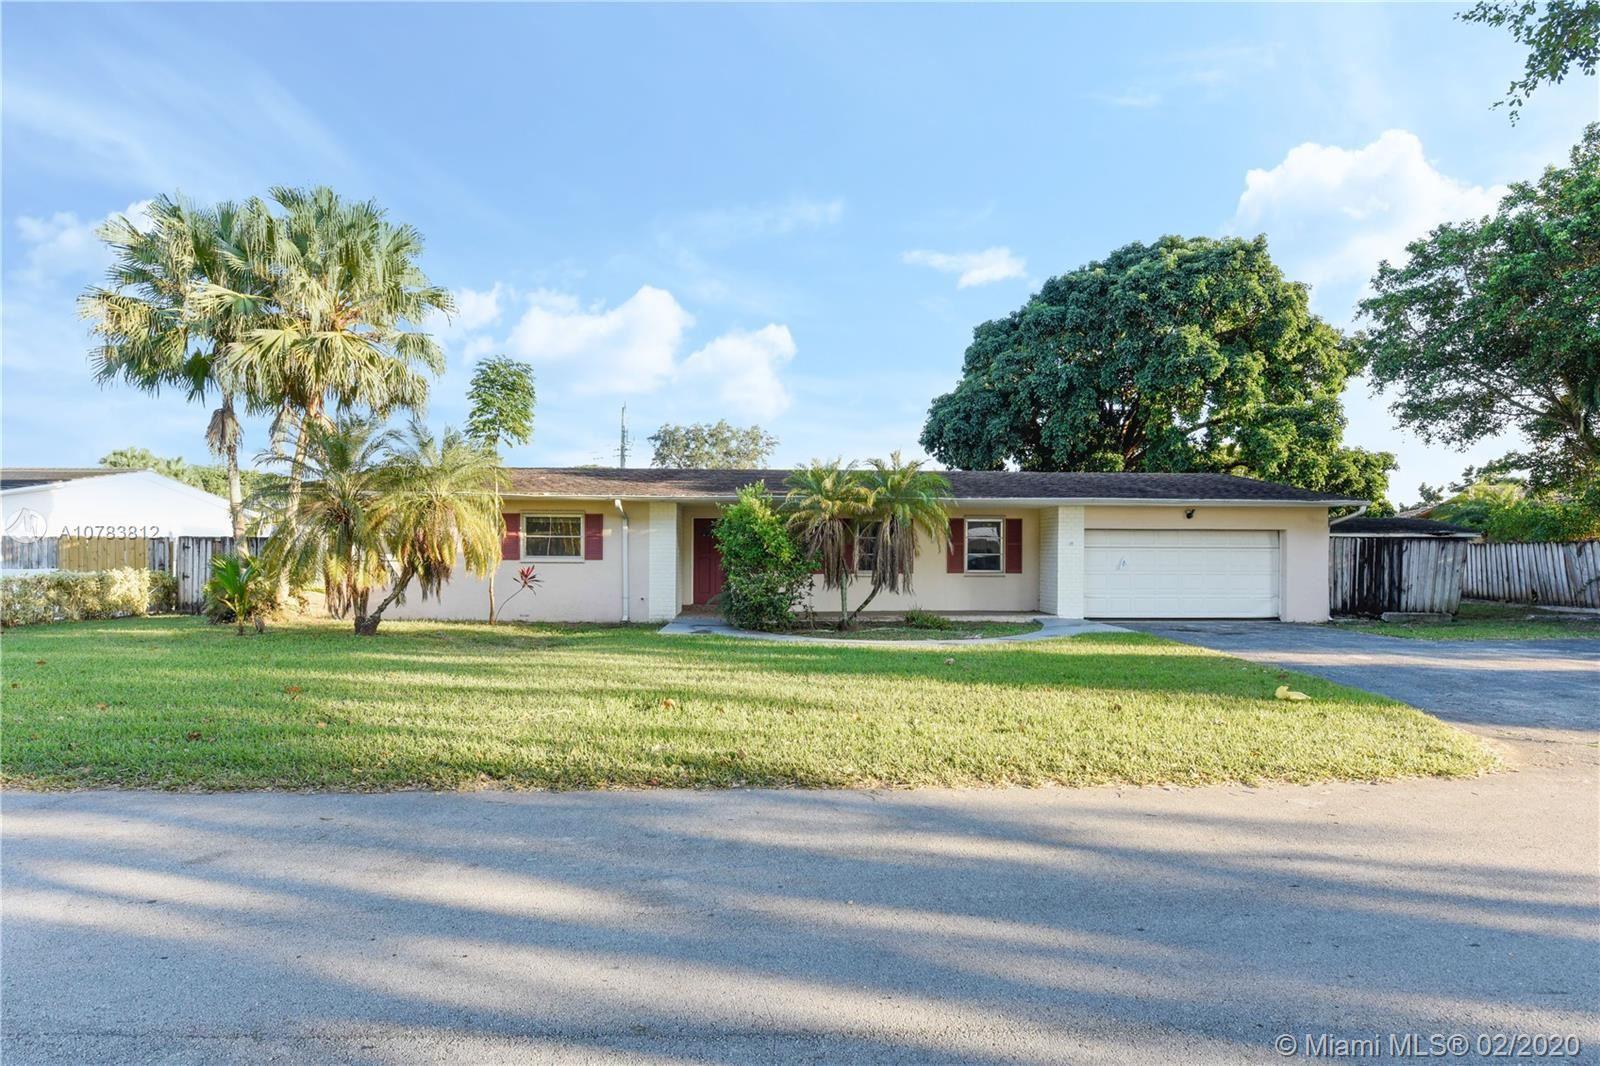 Photo of 9780 SW 141st Dr, Miami, FL 33176 (MLS # A10783812)